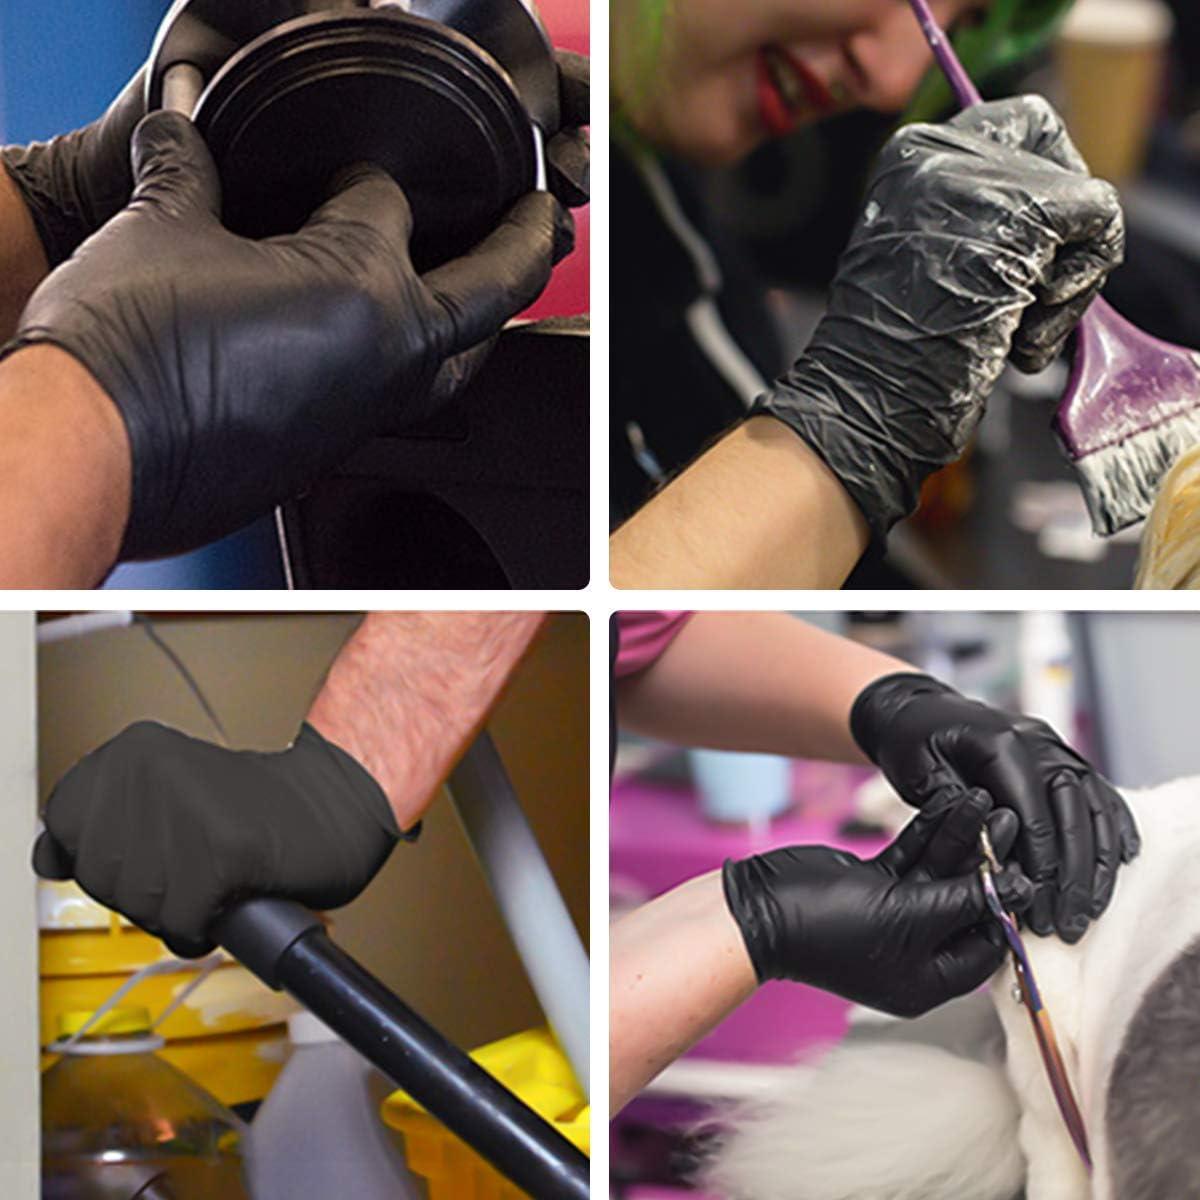 Handschuhe in Lebensmittelqualit/ät latexfrei puderfrei Mittel Janolia Nitril Einweghandschuhe 100 St/ück